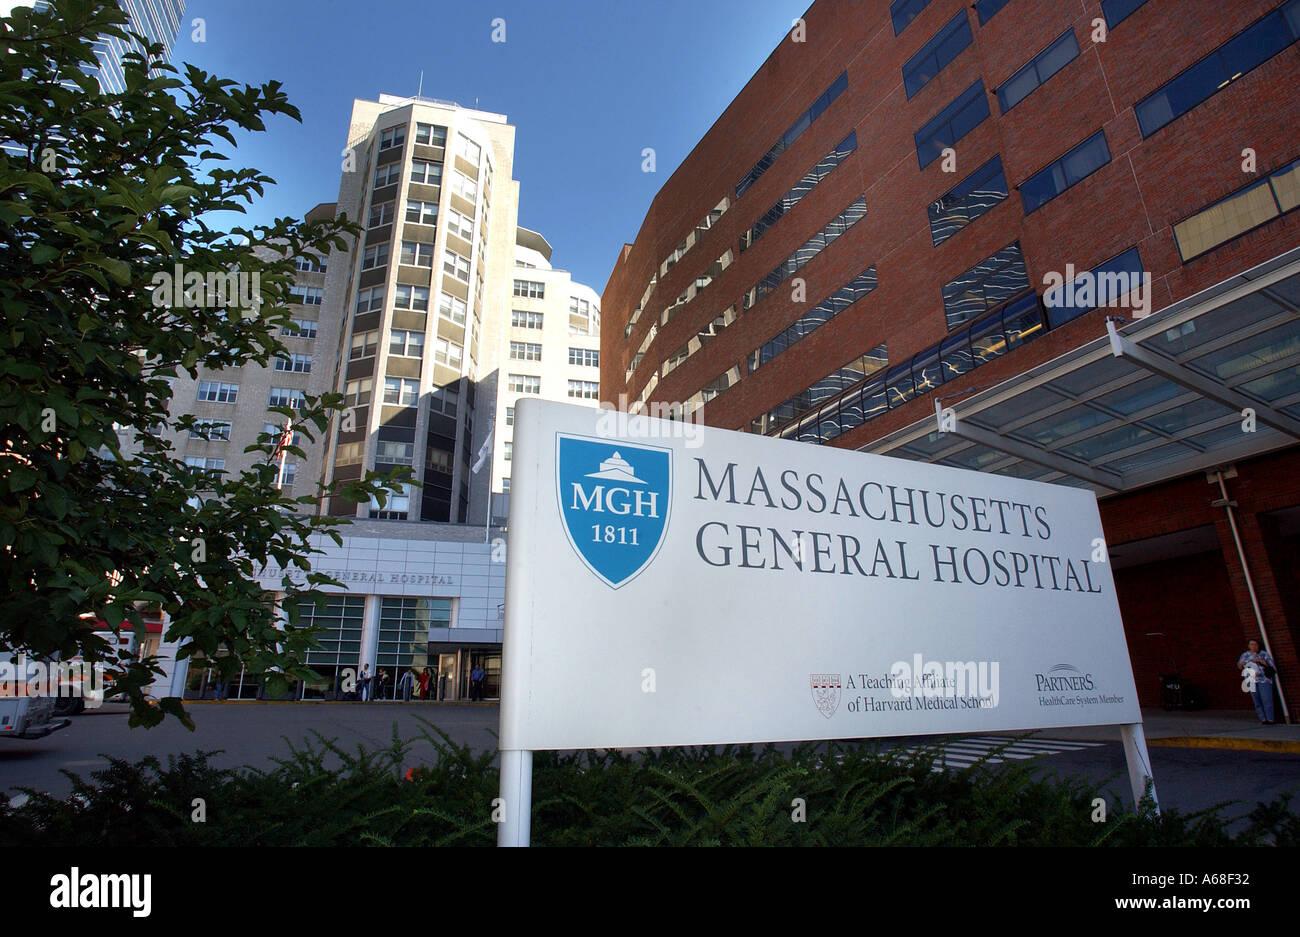 Mass General Hospital Stock Photos & Mass General Hospital